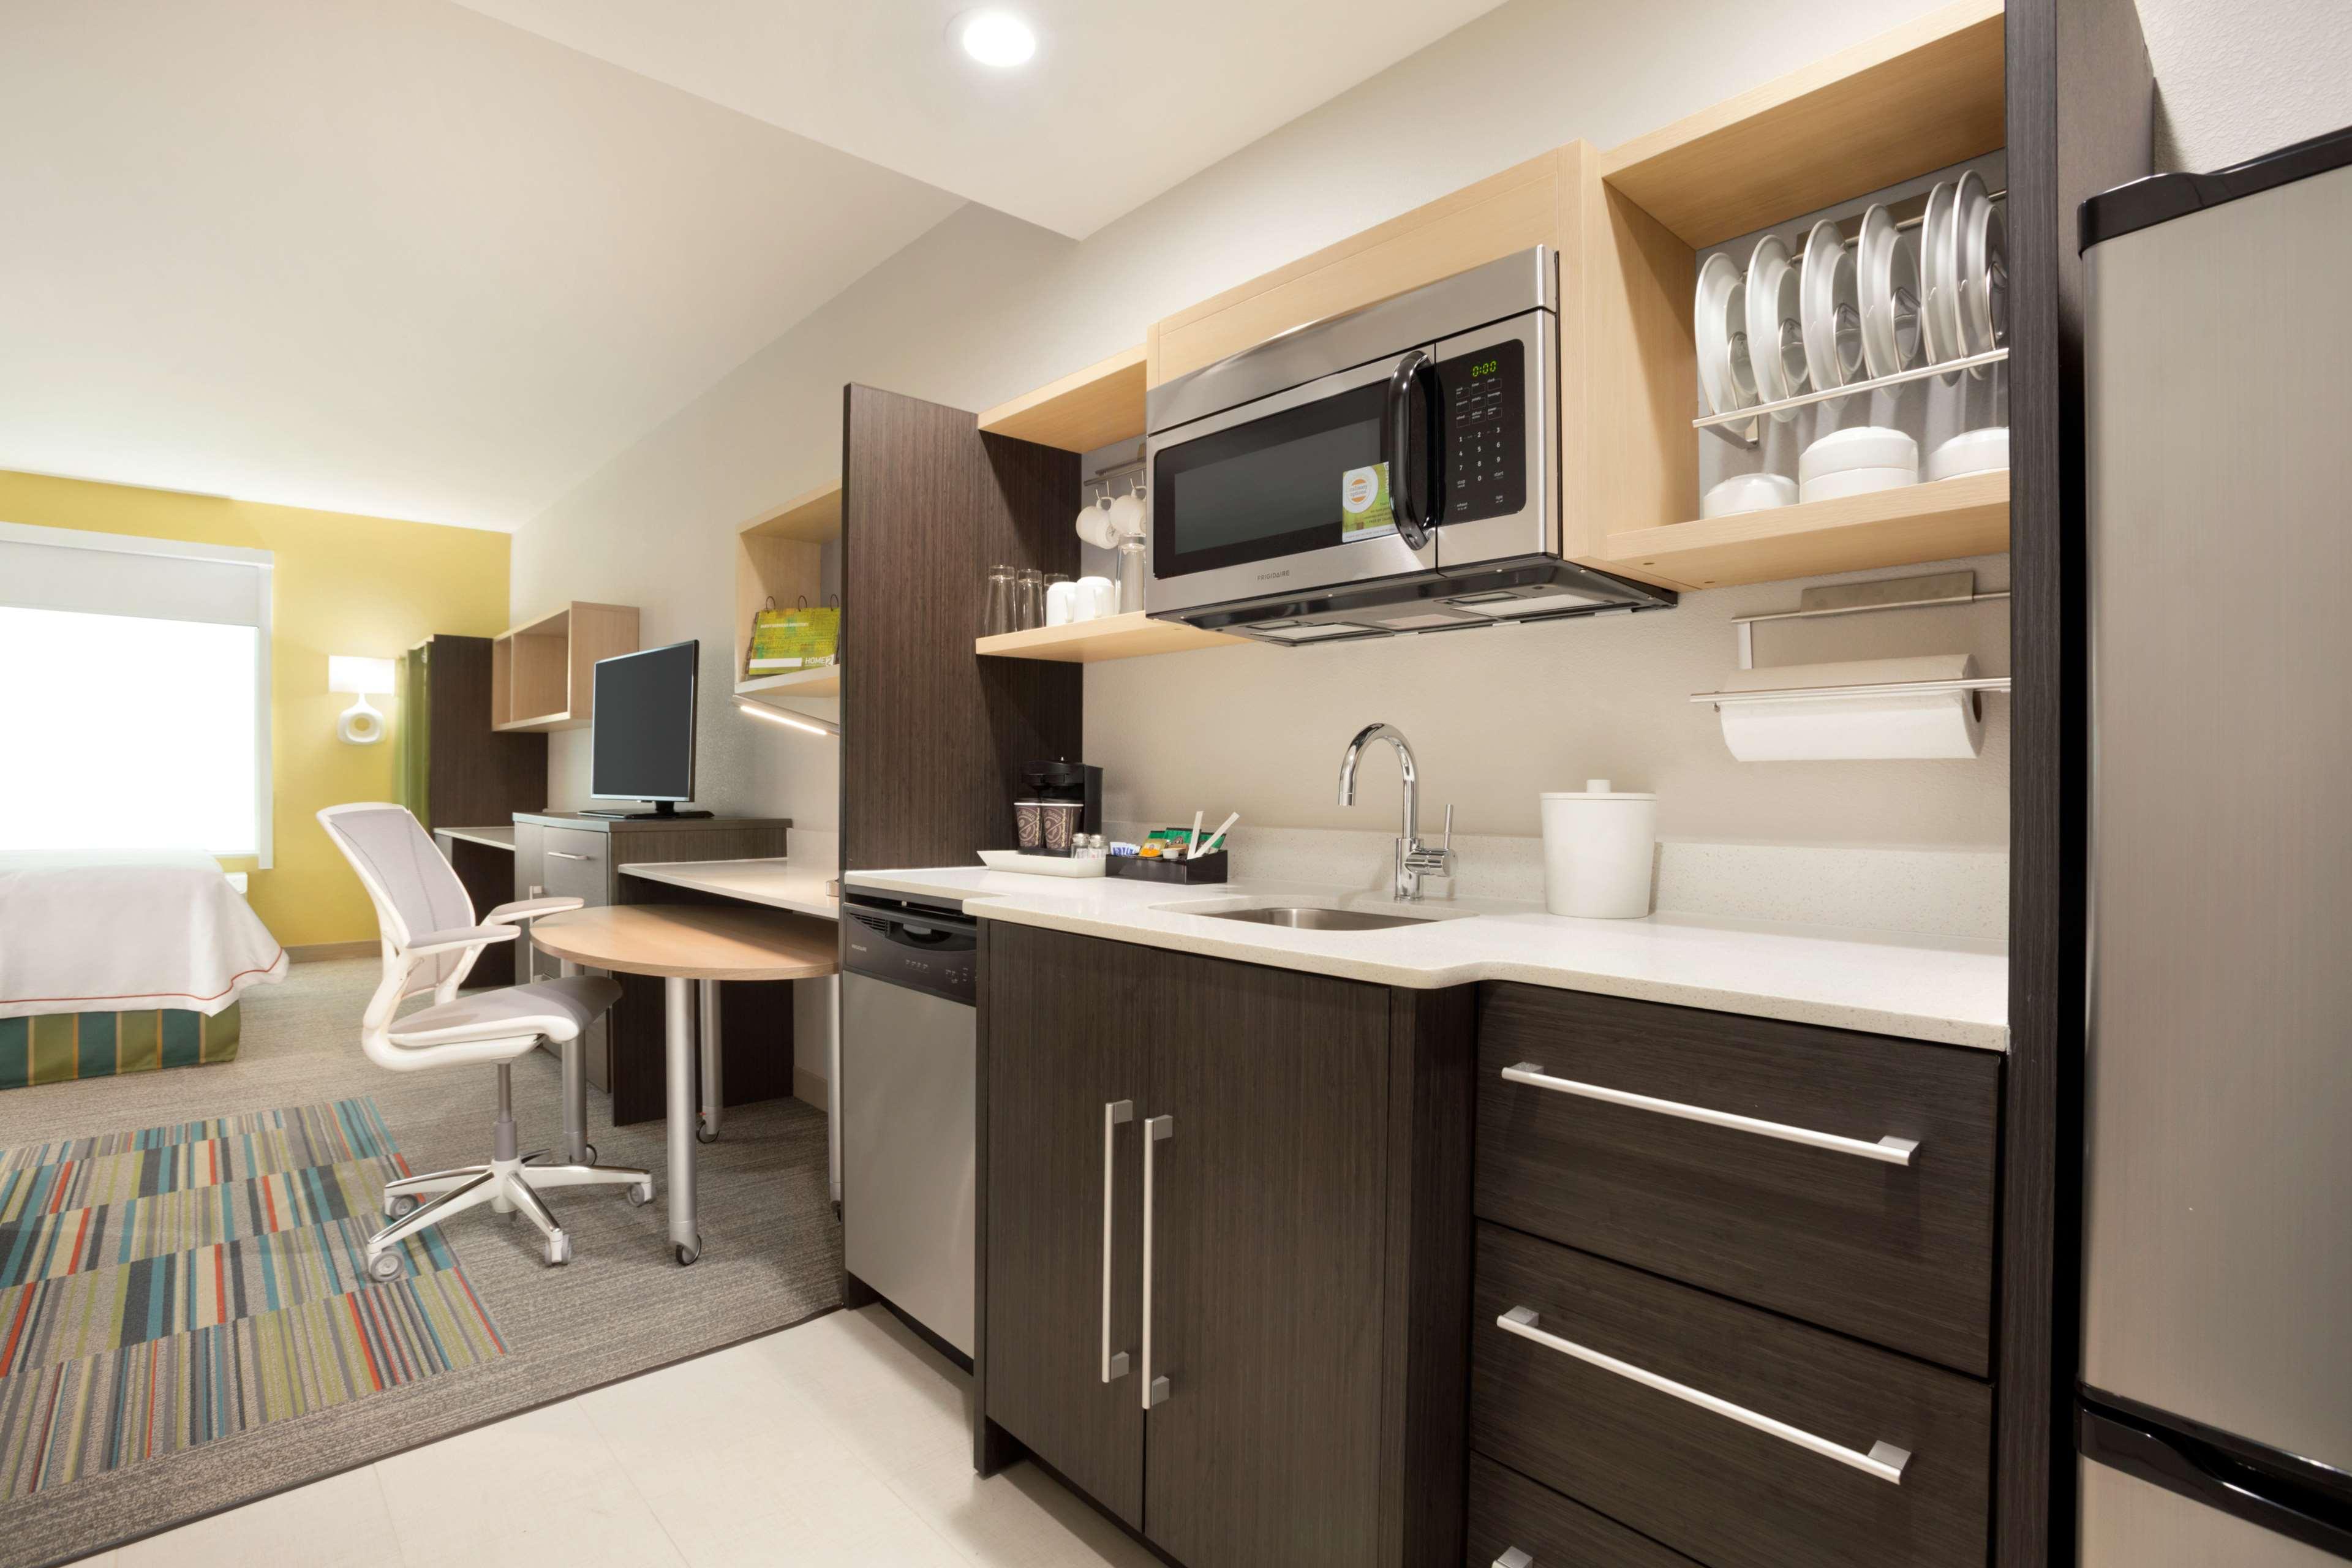 Home2 Suites by Hilton Houston/Webster image 18